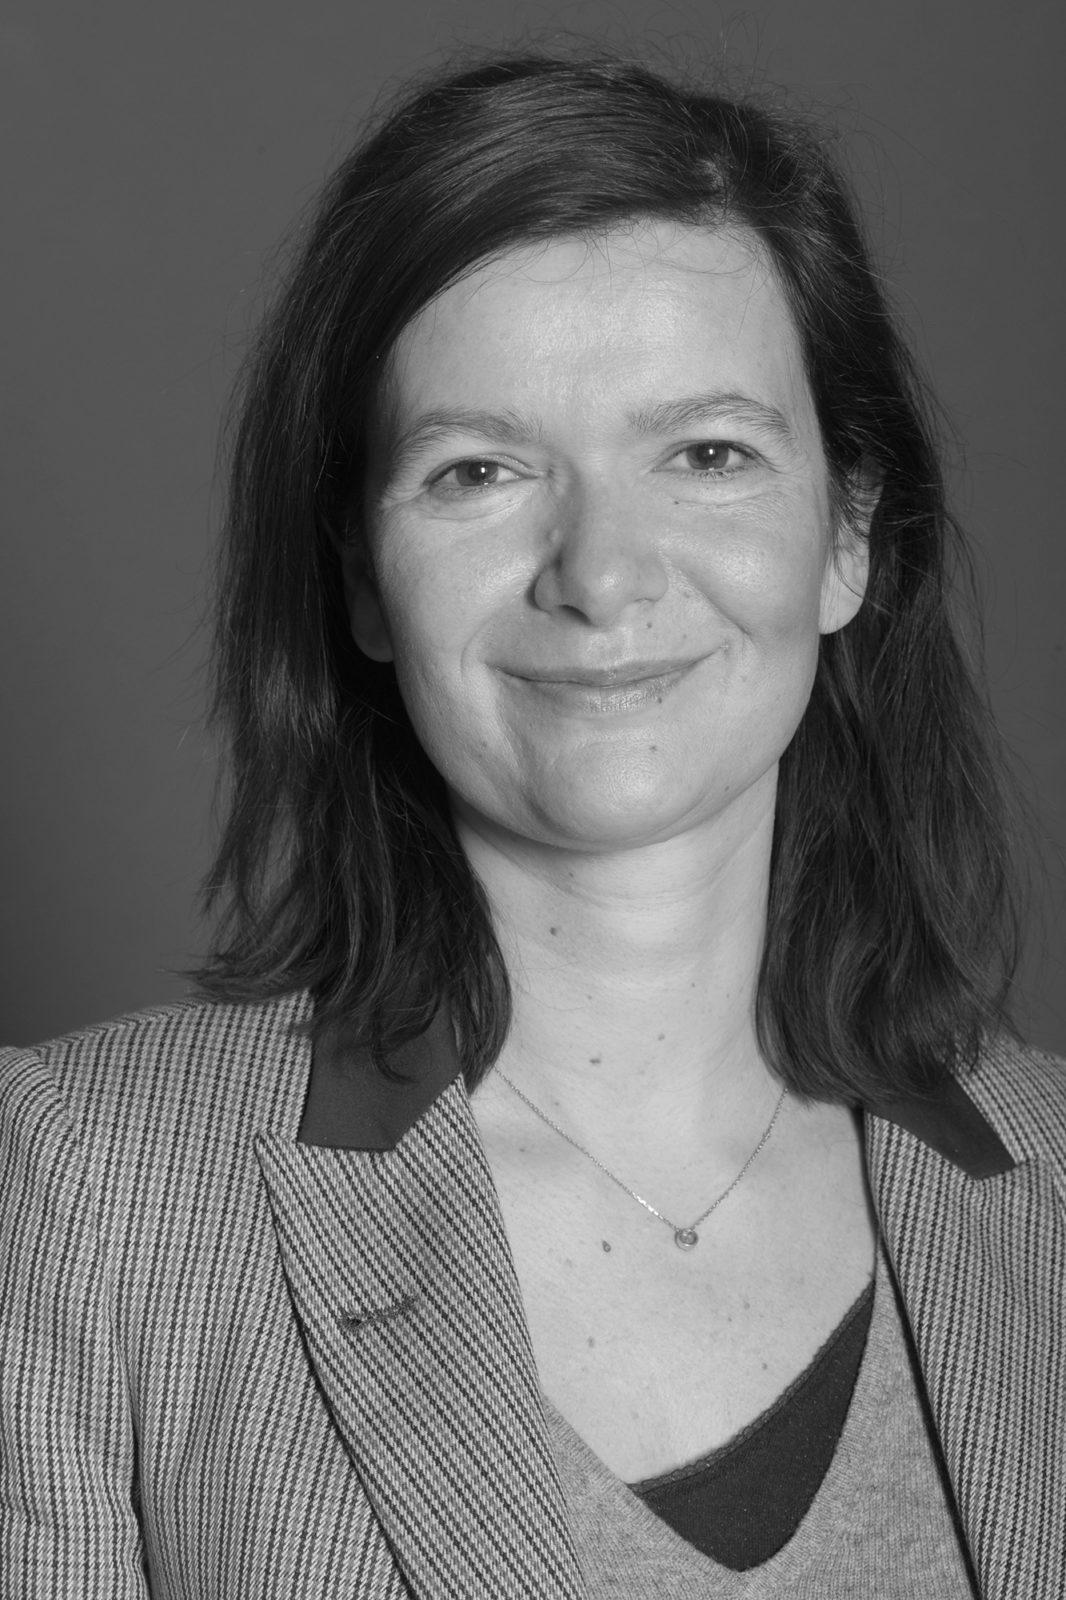 Tajan - Ariane Brissart-Lallier